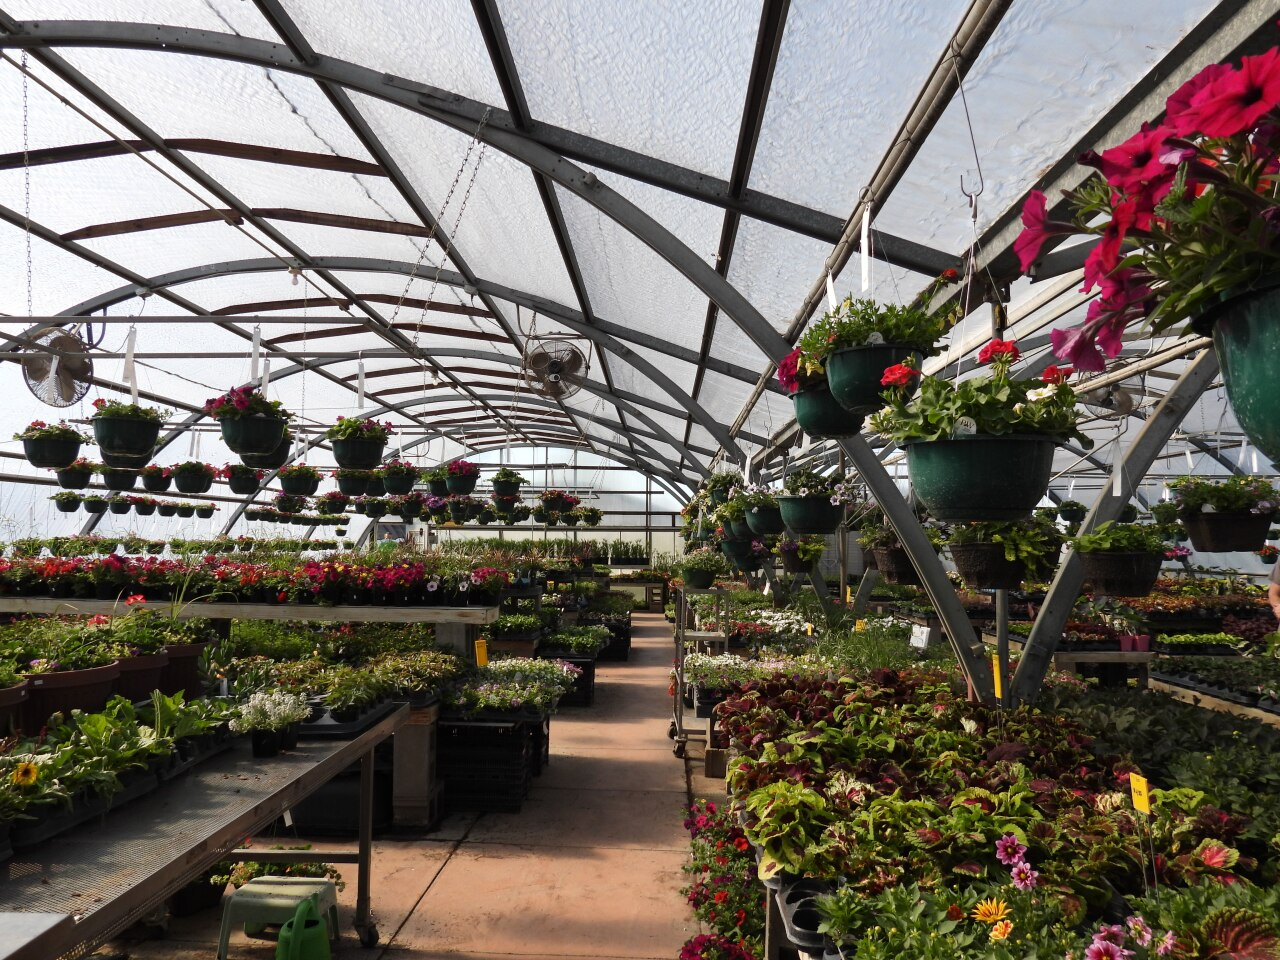 Wenninghoff Farm's greenhouse